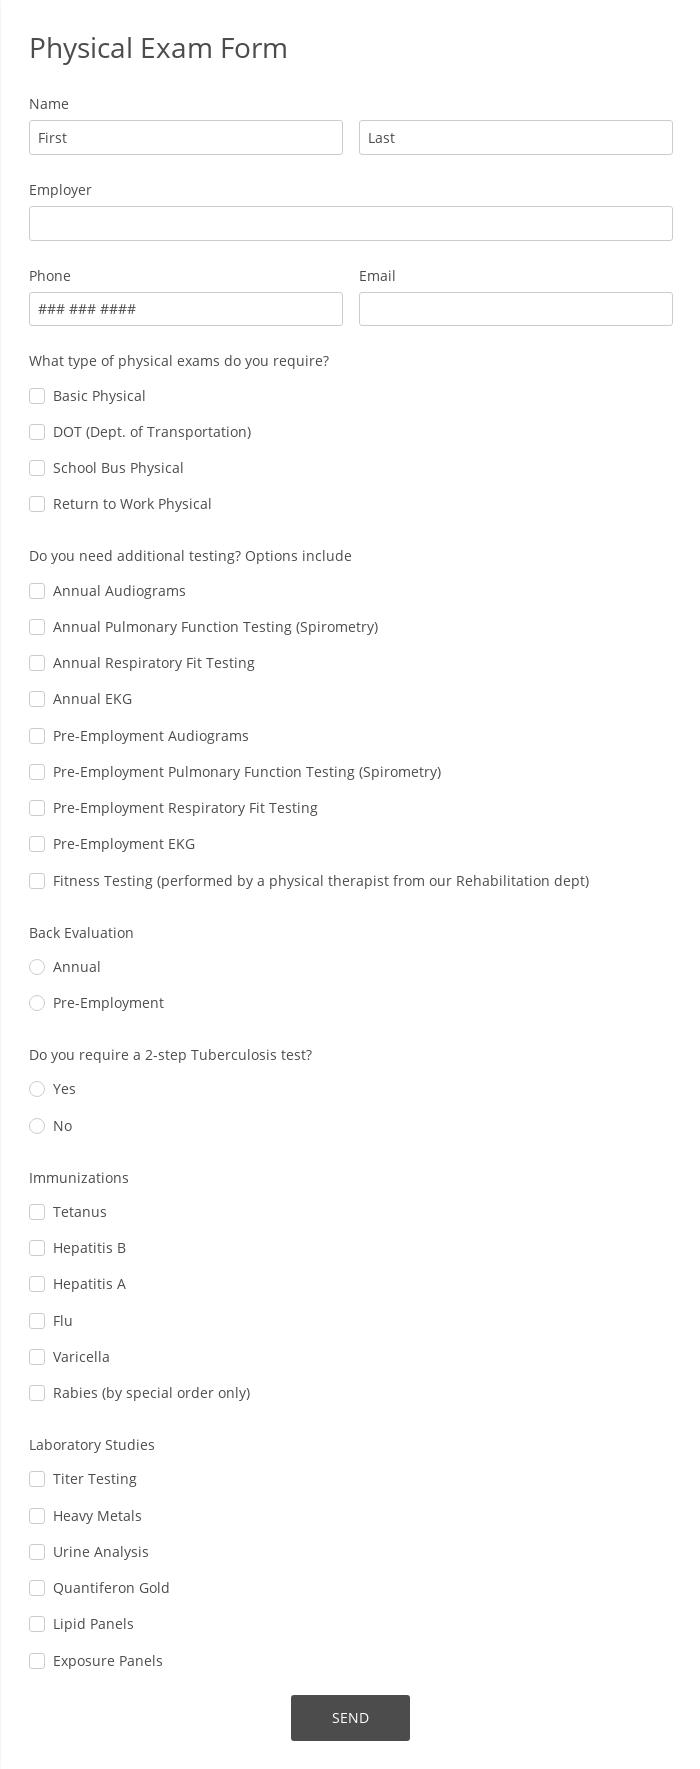 Physical Exam Form